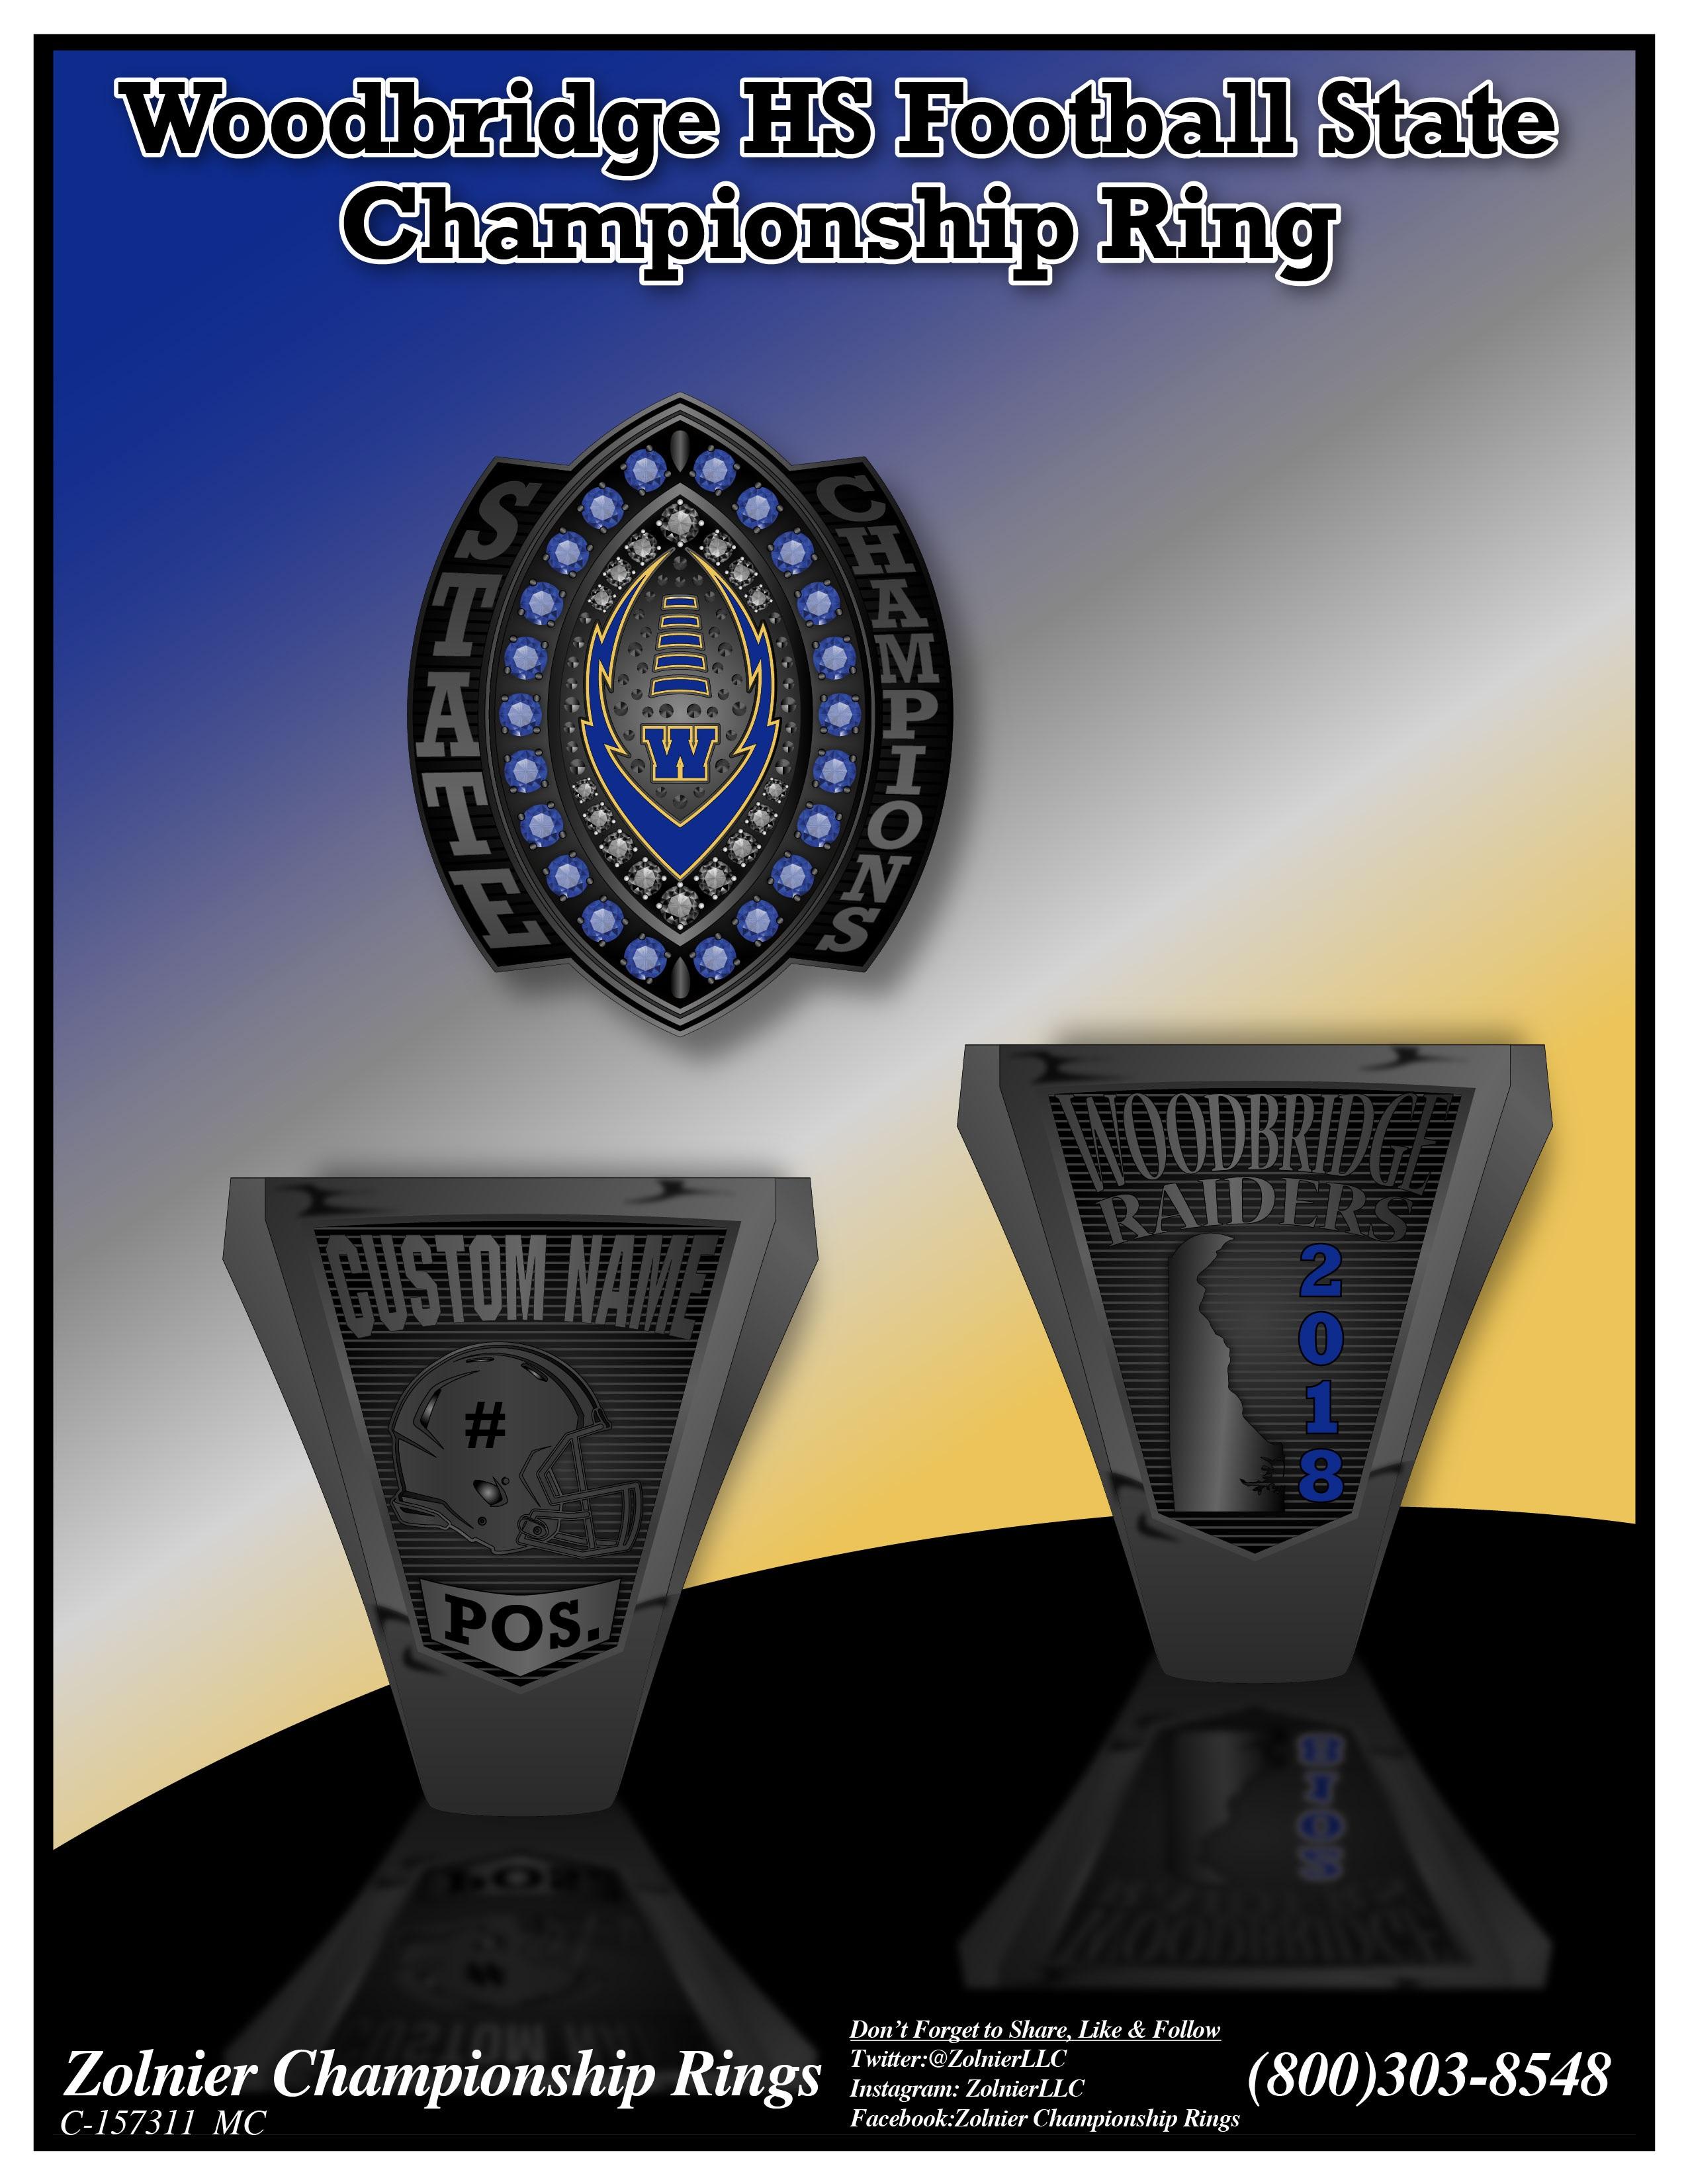 C-157311 Woodbridge HS Football Champ Ring 2